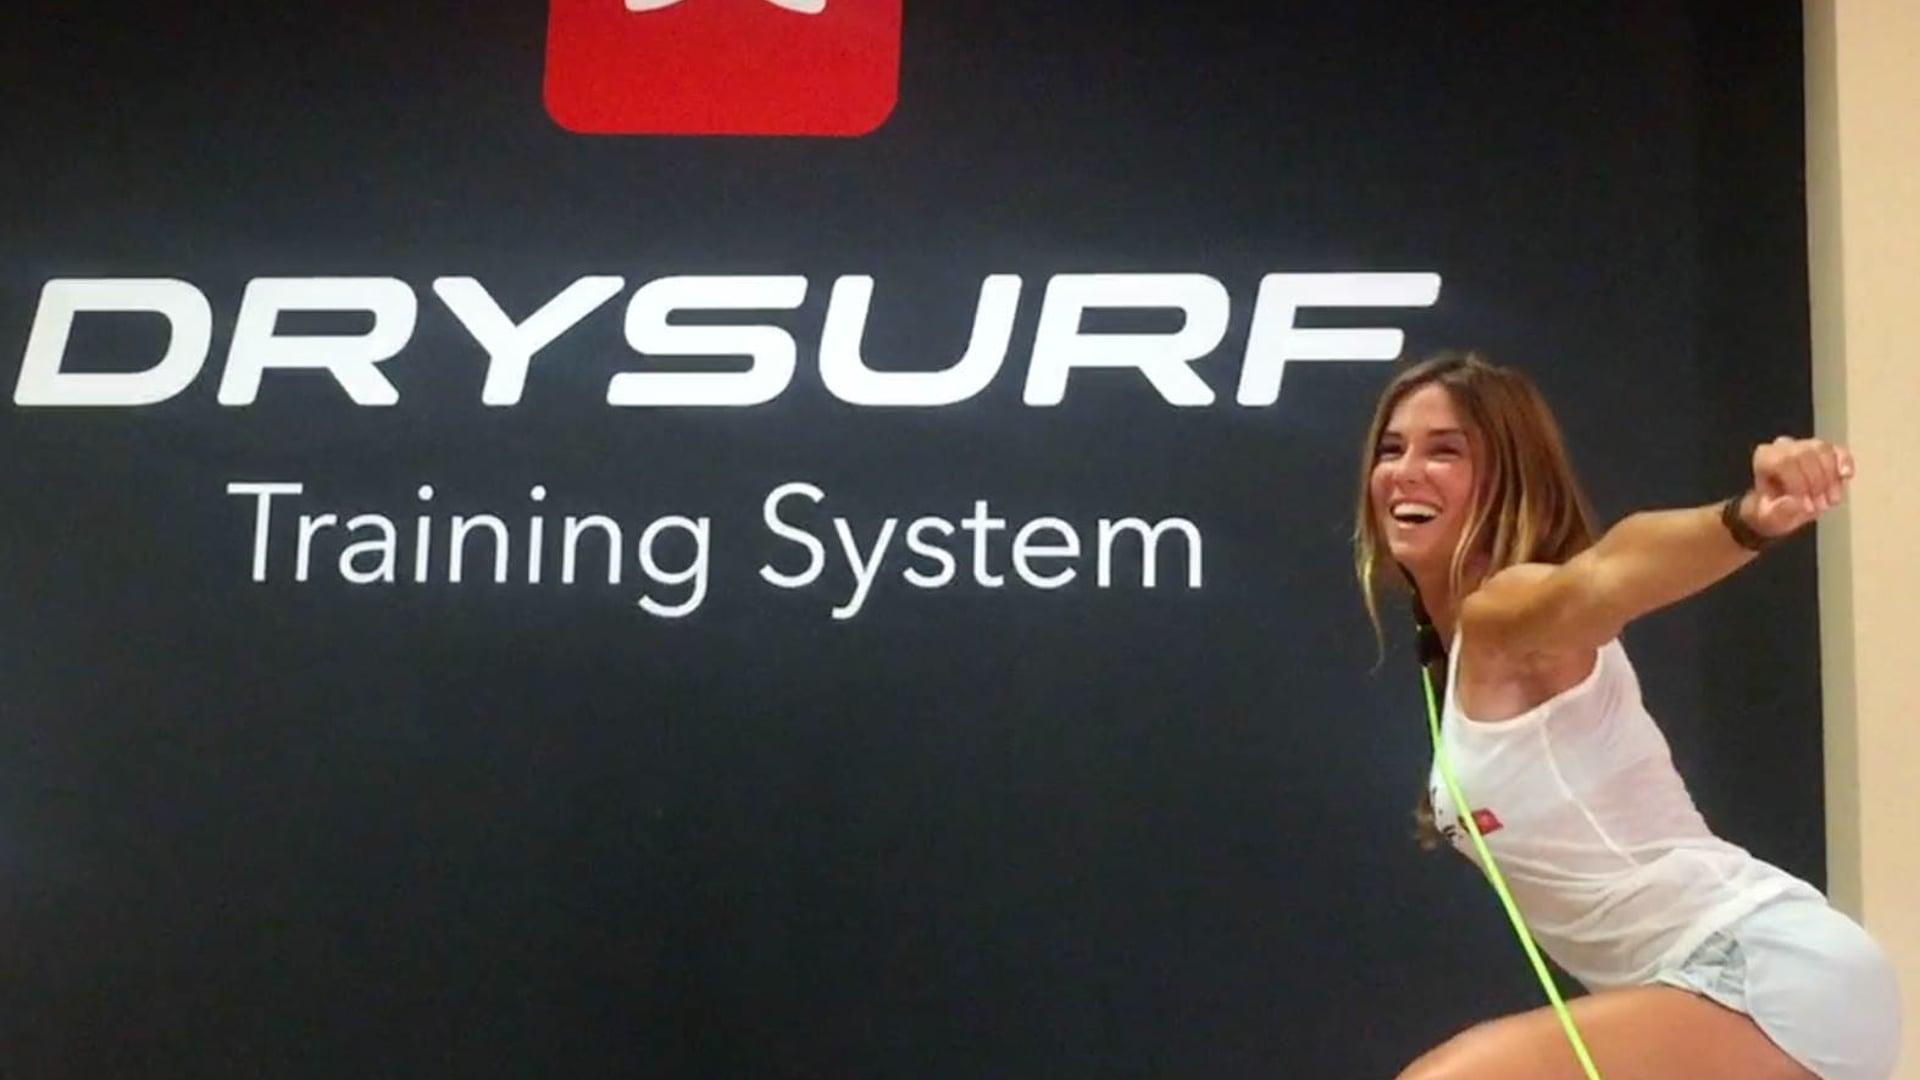 Drysurf Fitness & Surfing